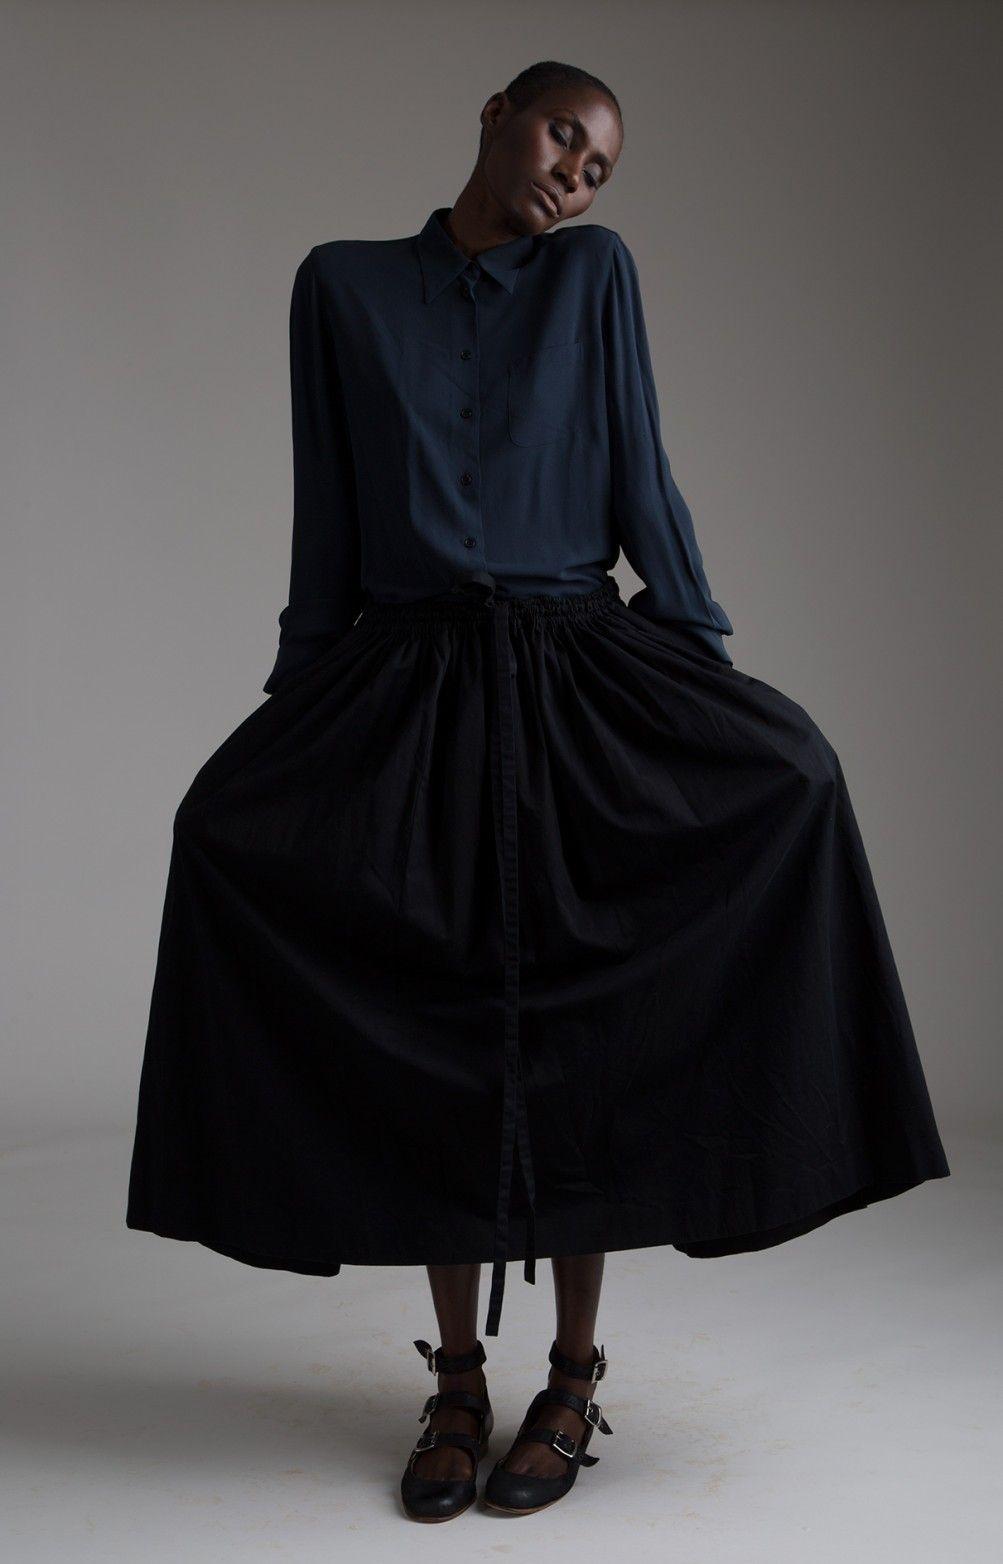 Vintage Yohji Yamamoto Men S Skirt Japanese Fashion Designers Fashion Vintage Designer Clothing